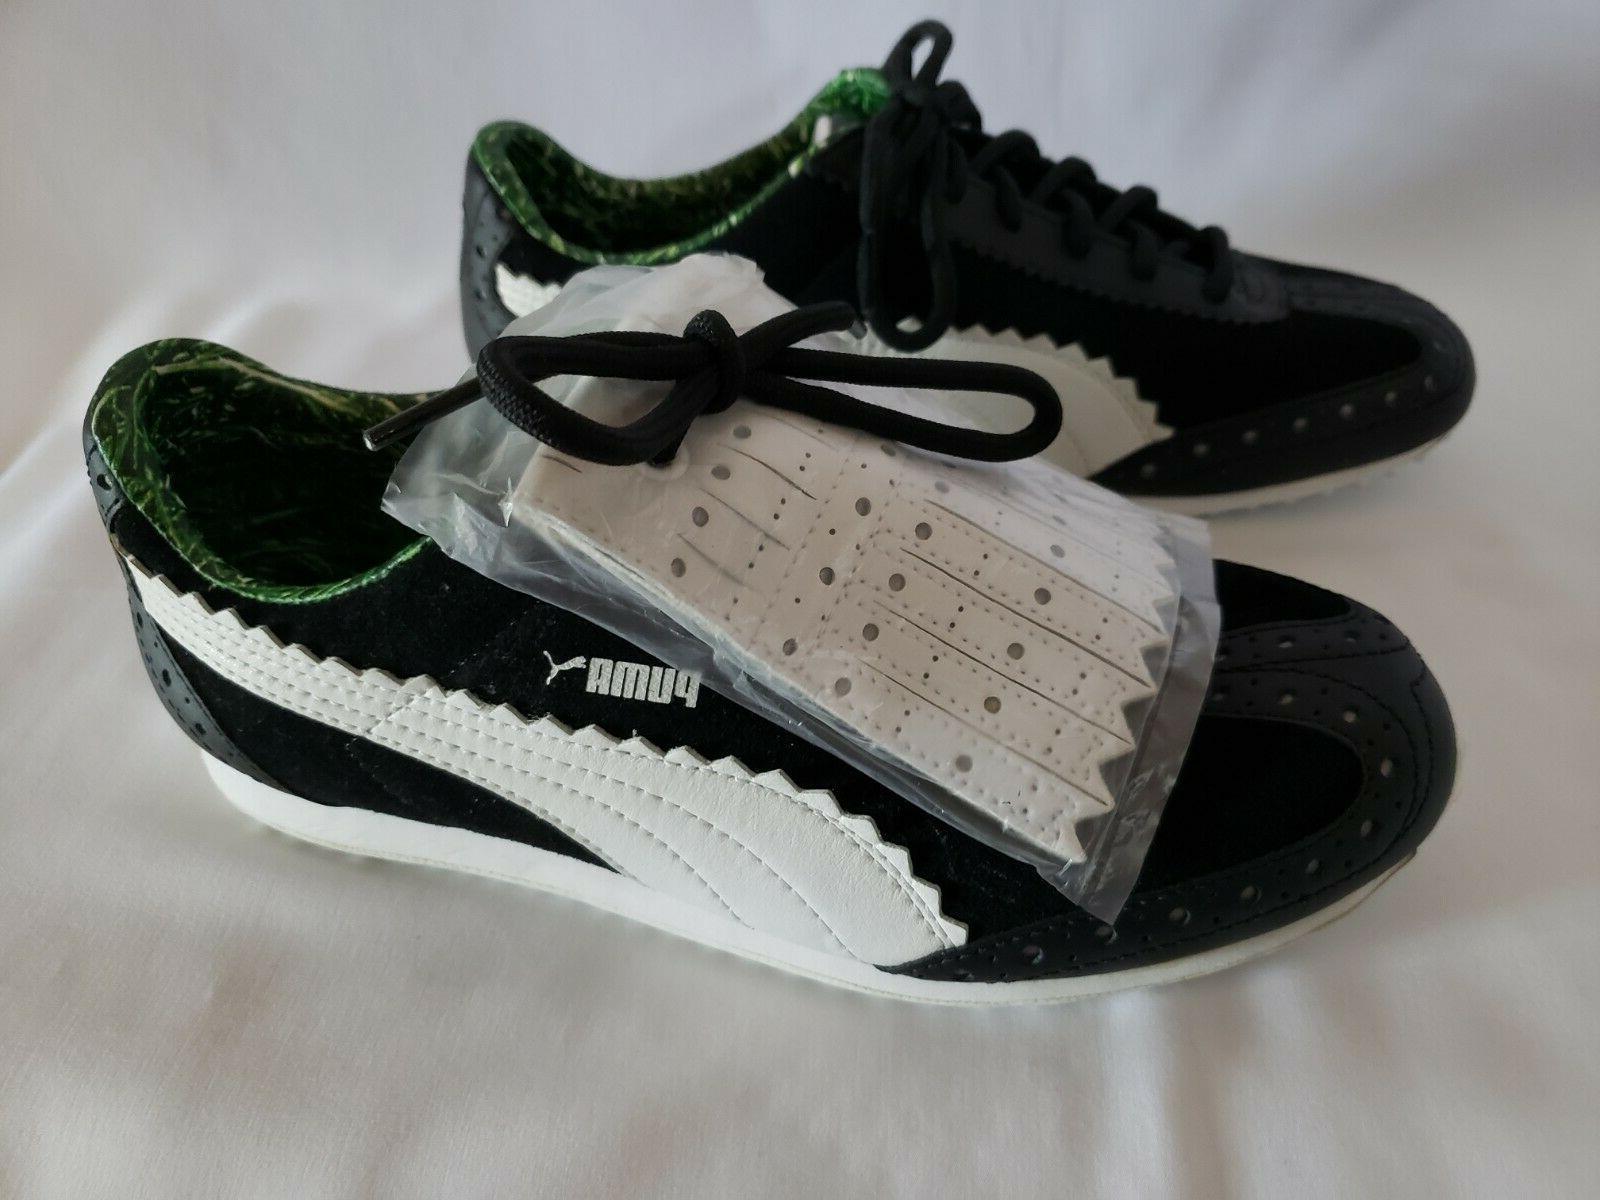 PUMA Ladies Black Whte Oxford /Golf Shoes 8